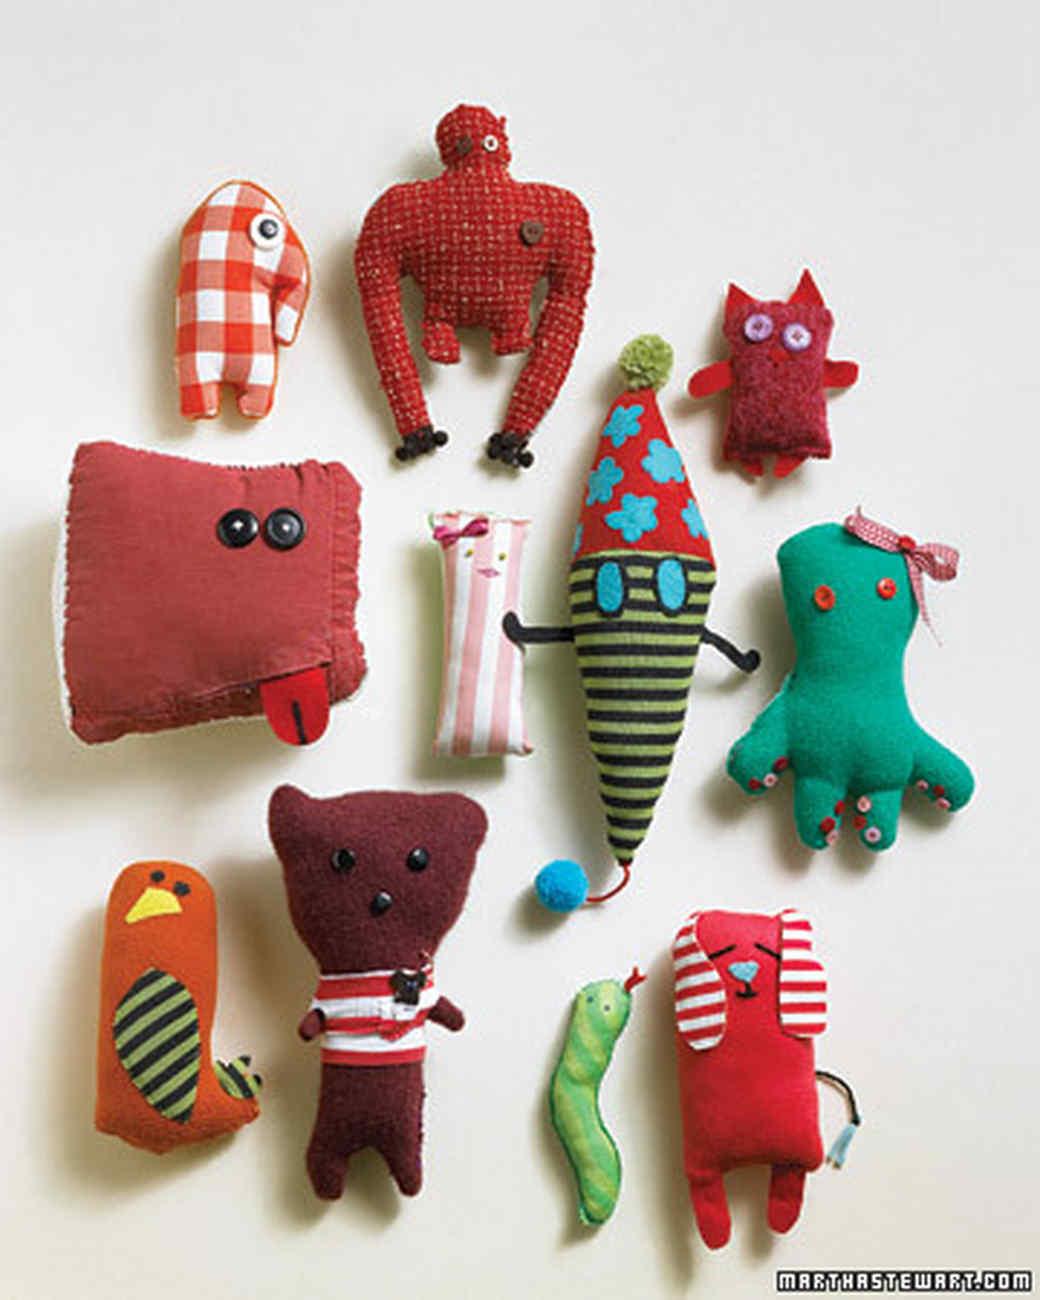 Handmade Gifts for Kids | Martha Stewart